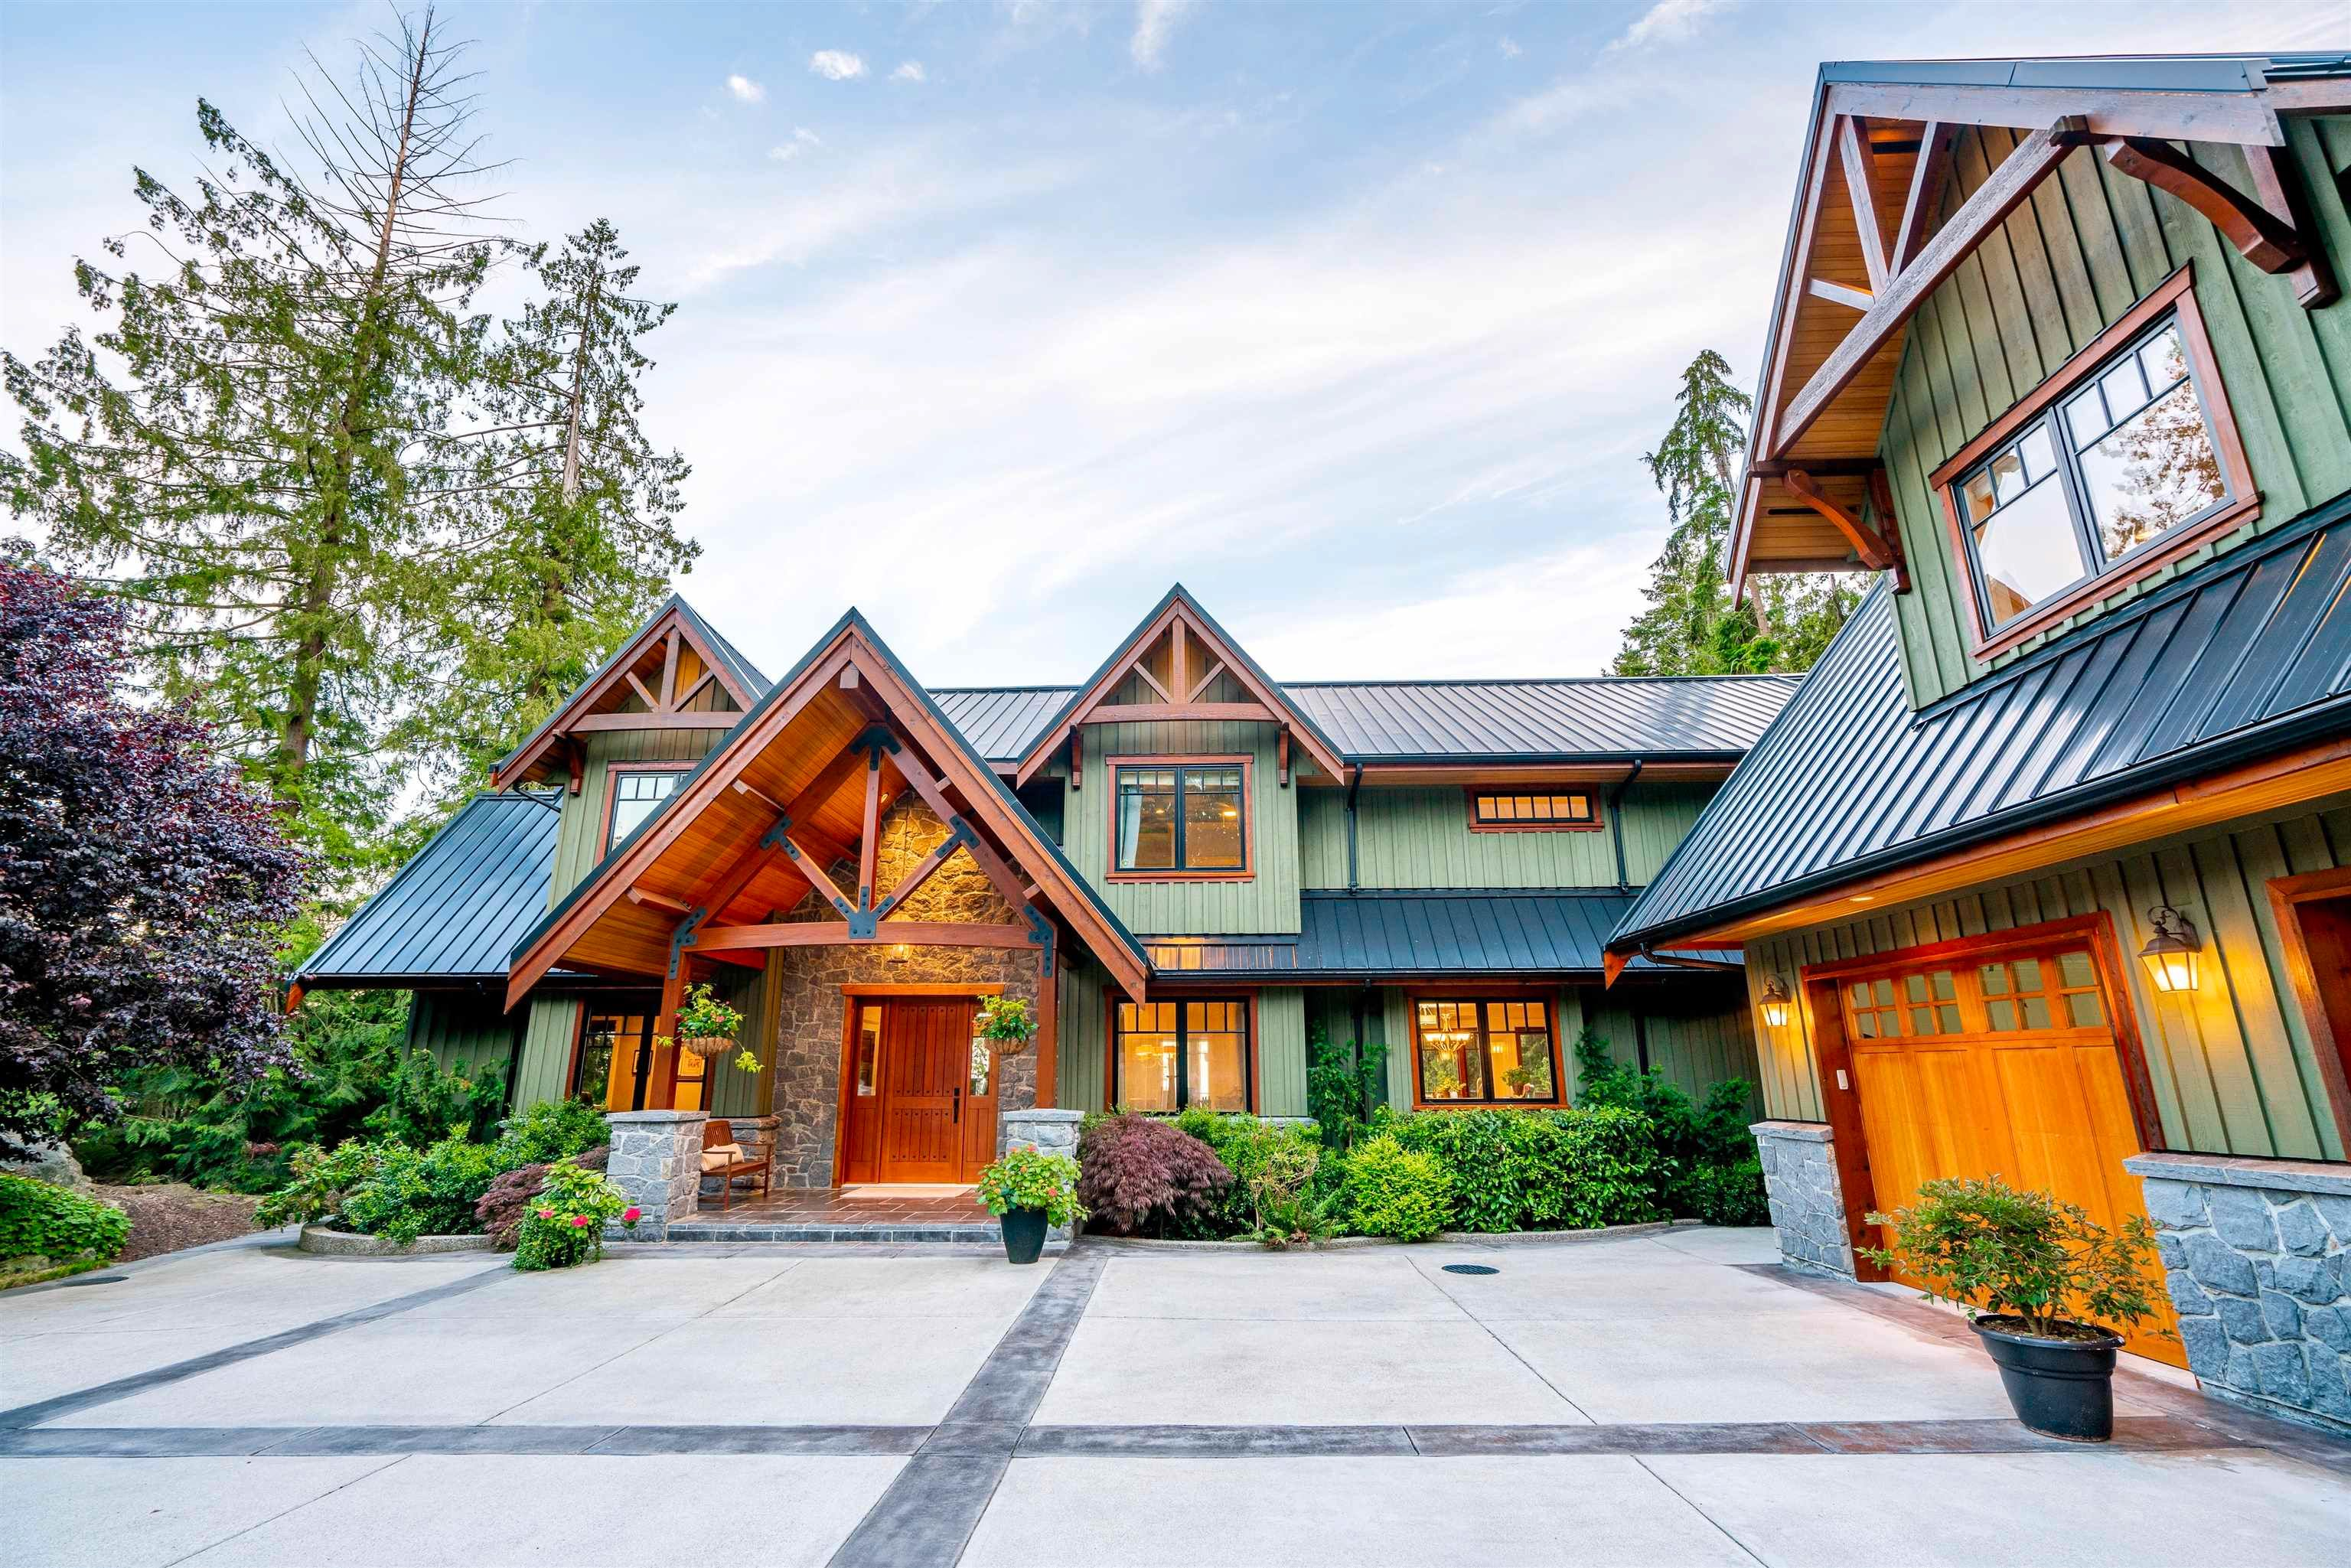 Main Photo: 949 ARBUTUS BAY Lane: Bowen Island House for sale : MLS®# R2615940